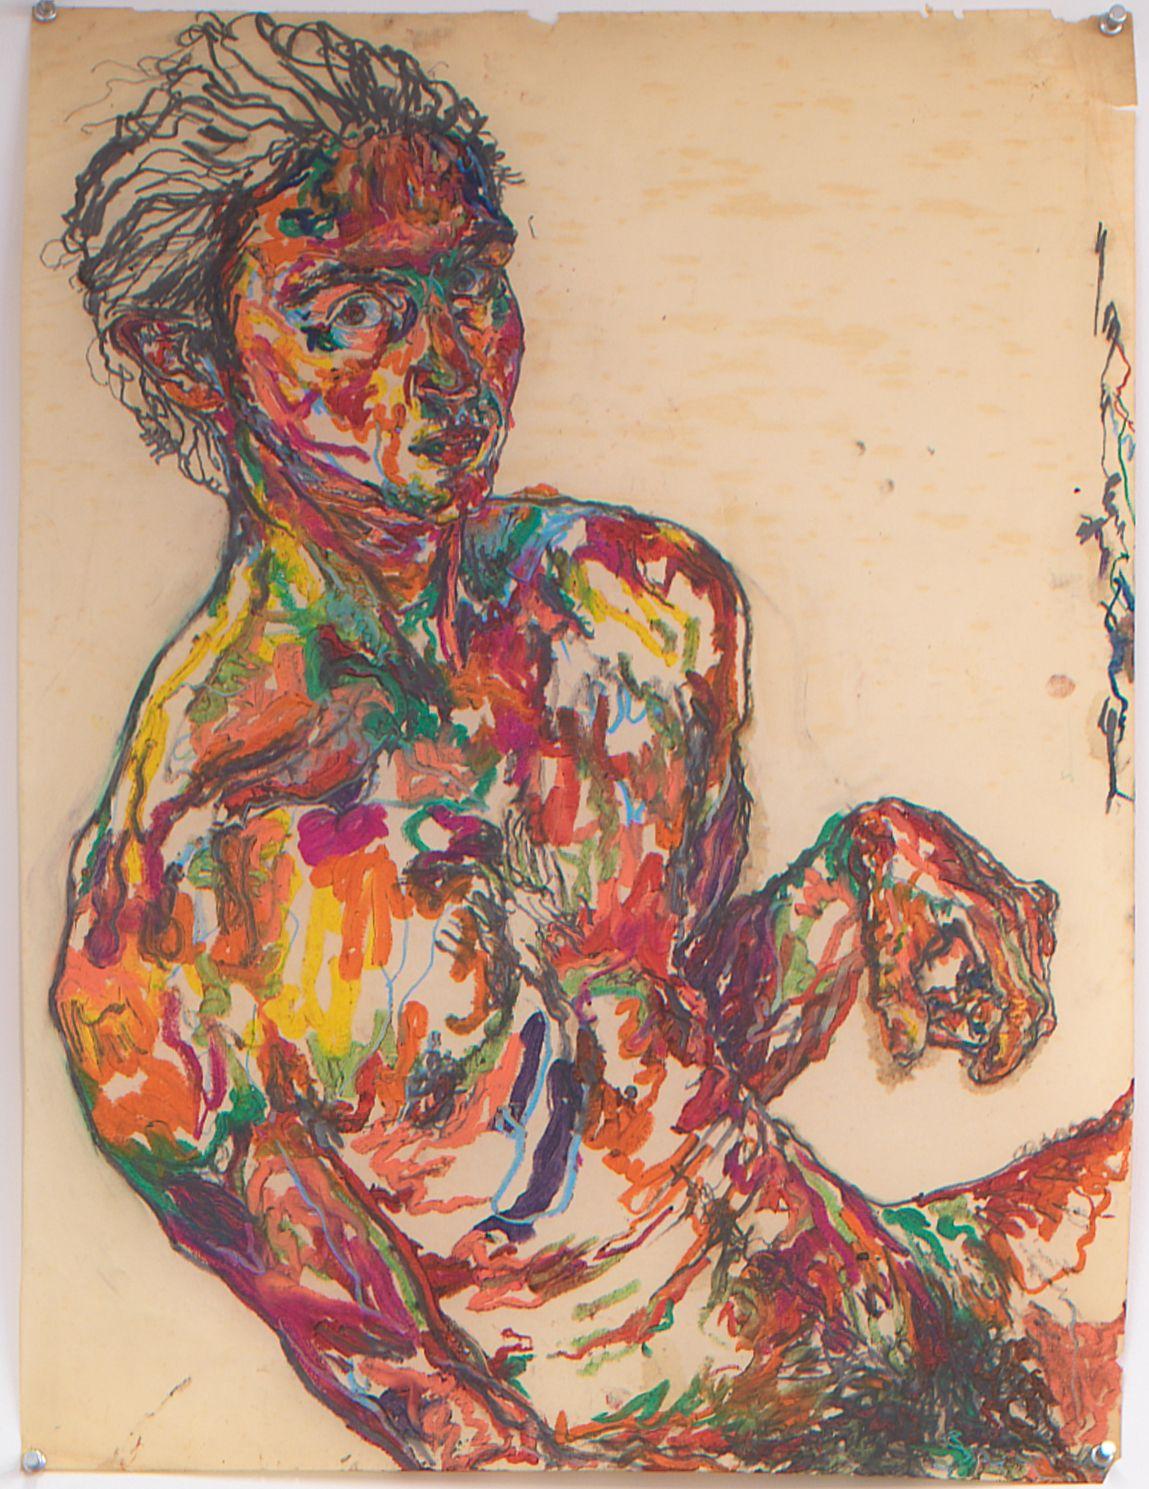 Self Portrait I, 1979, Oil pastel and graphite on vellum